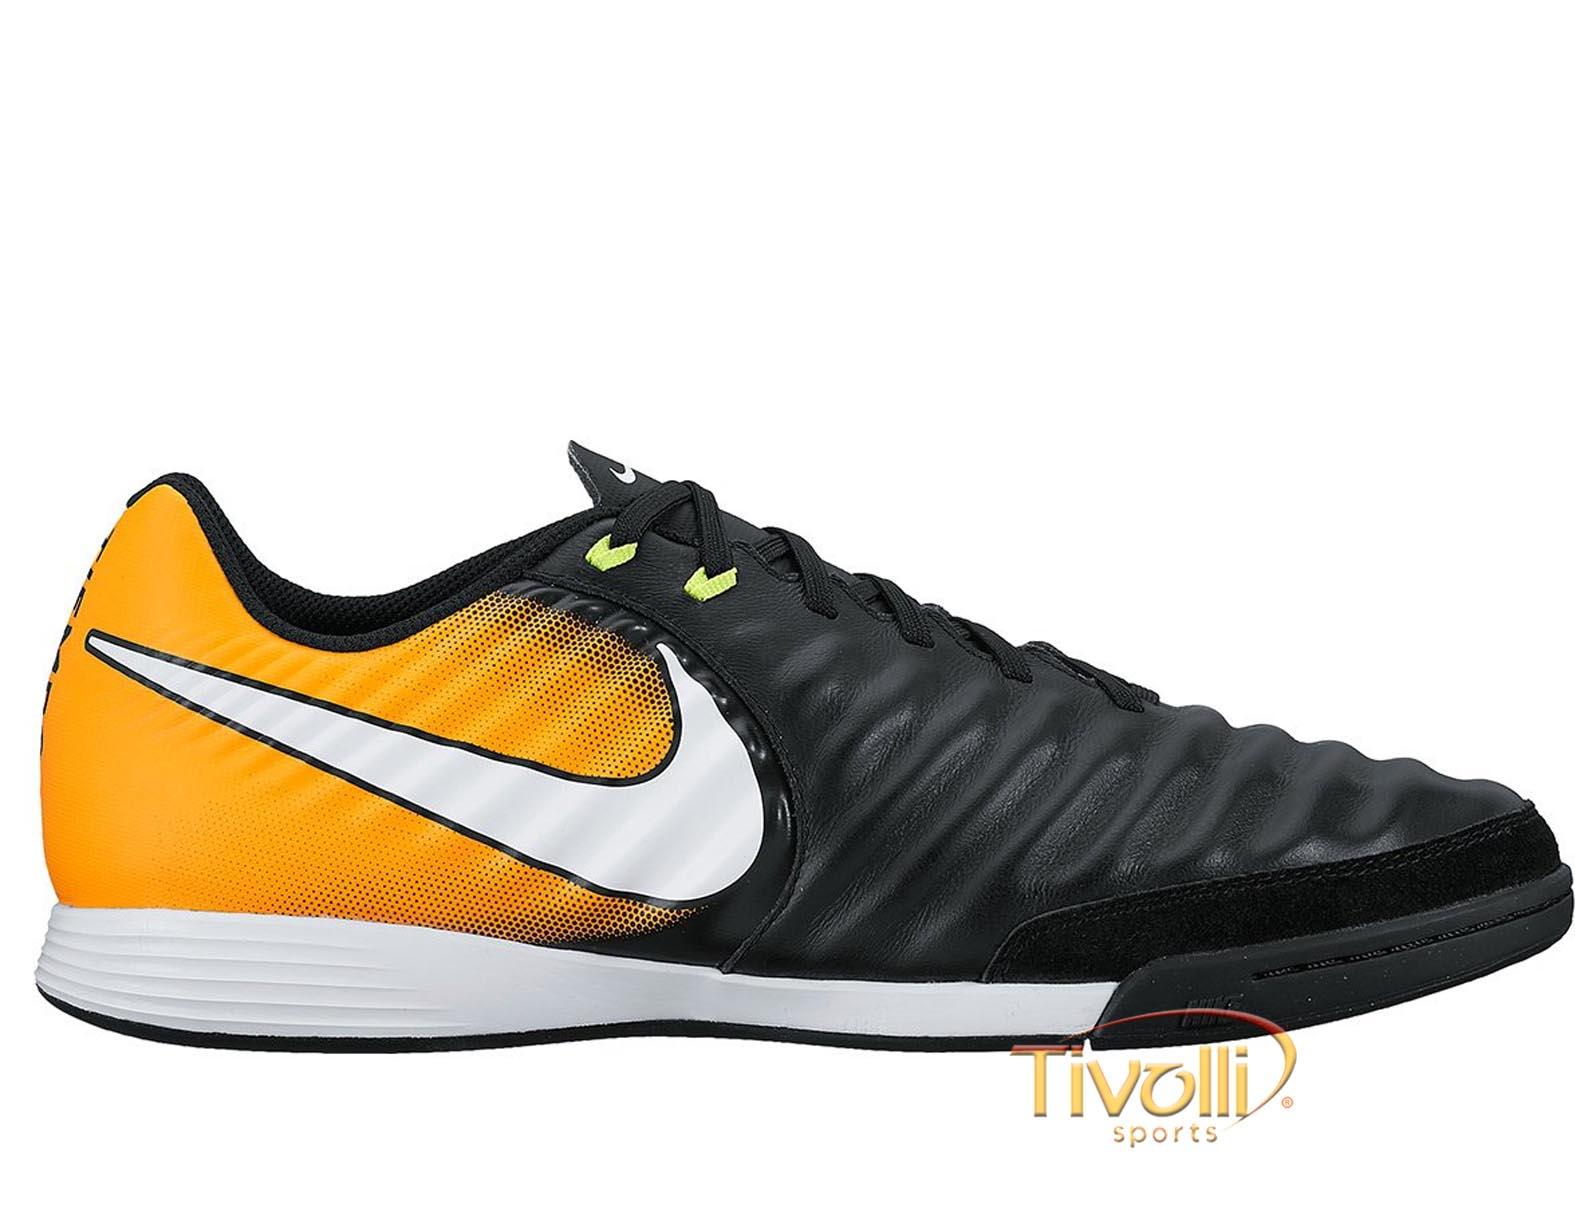 Chuteira Nike TiempoX Ligera IV IC Futsal     b61197e3bdb9d